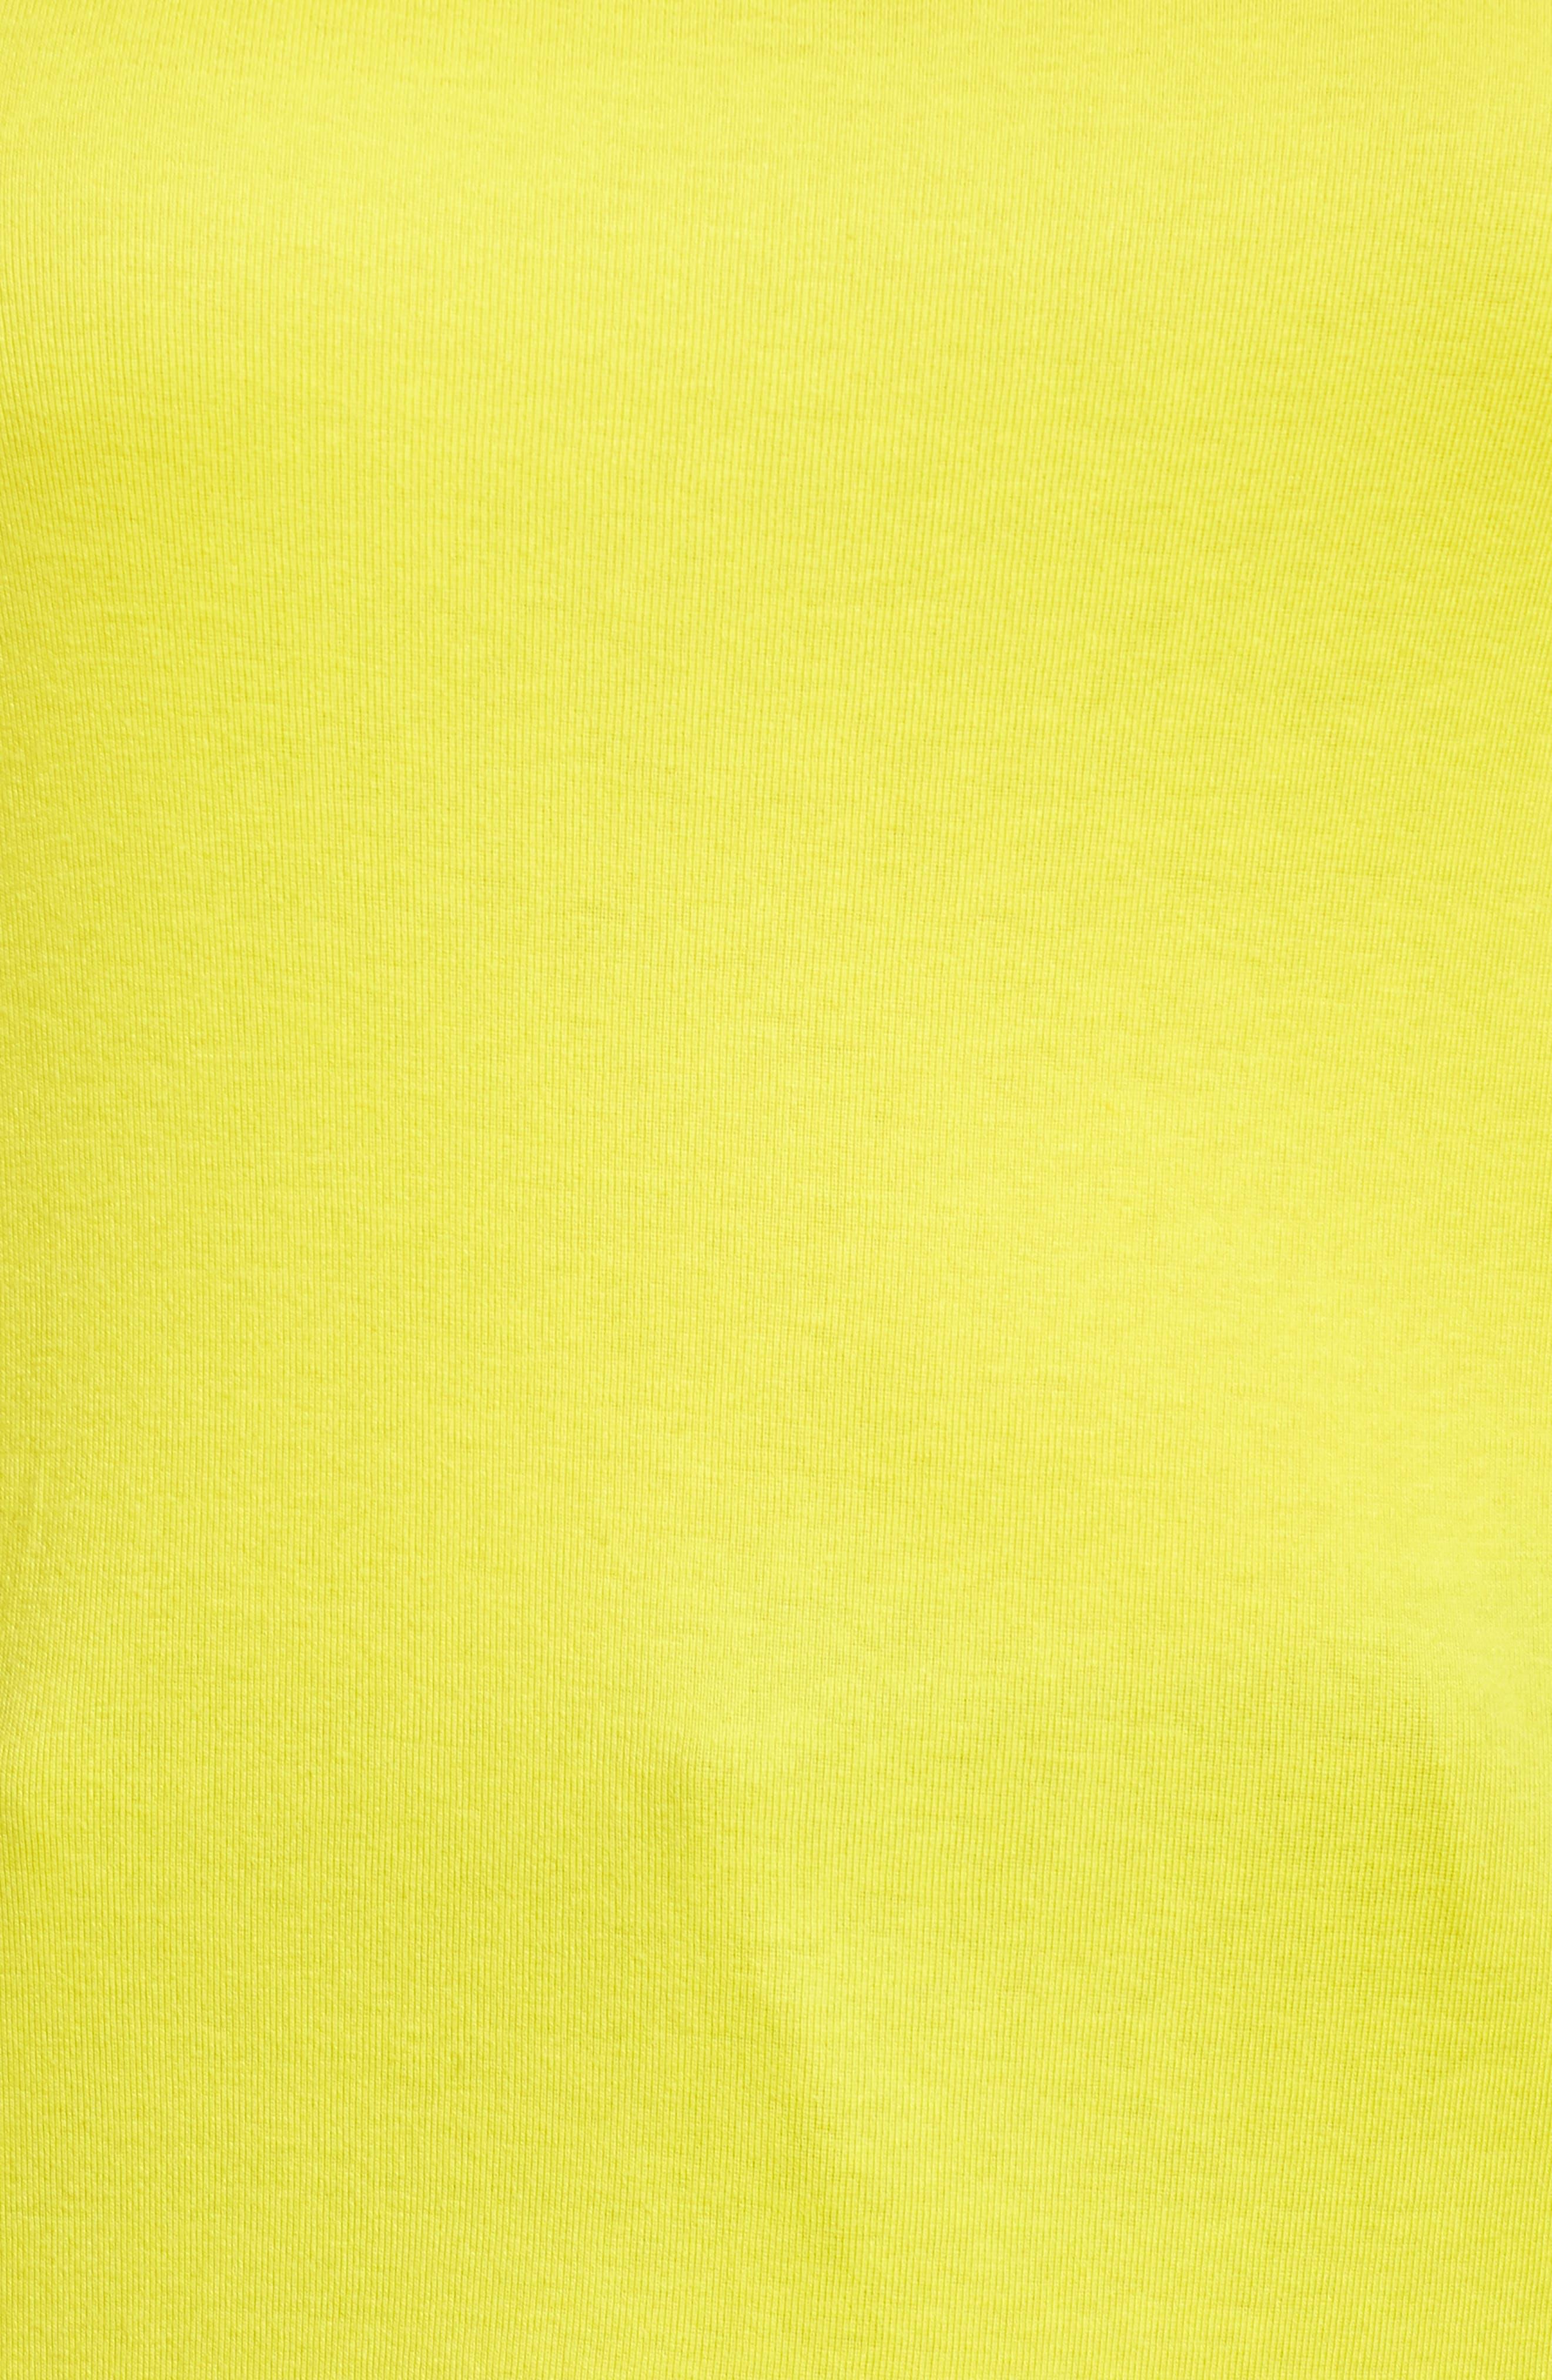 Cap Sleeve Ribbed Tee,                             Alternate thumbnail 5, color,                             Yellow Vibrant